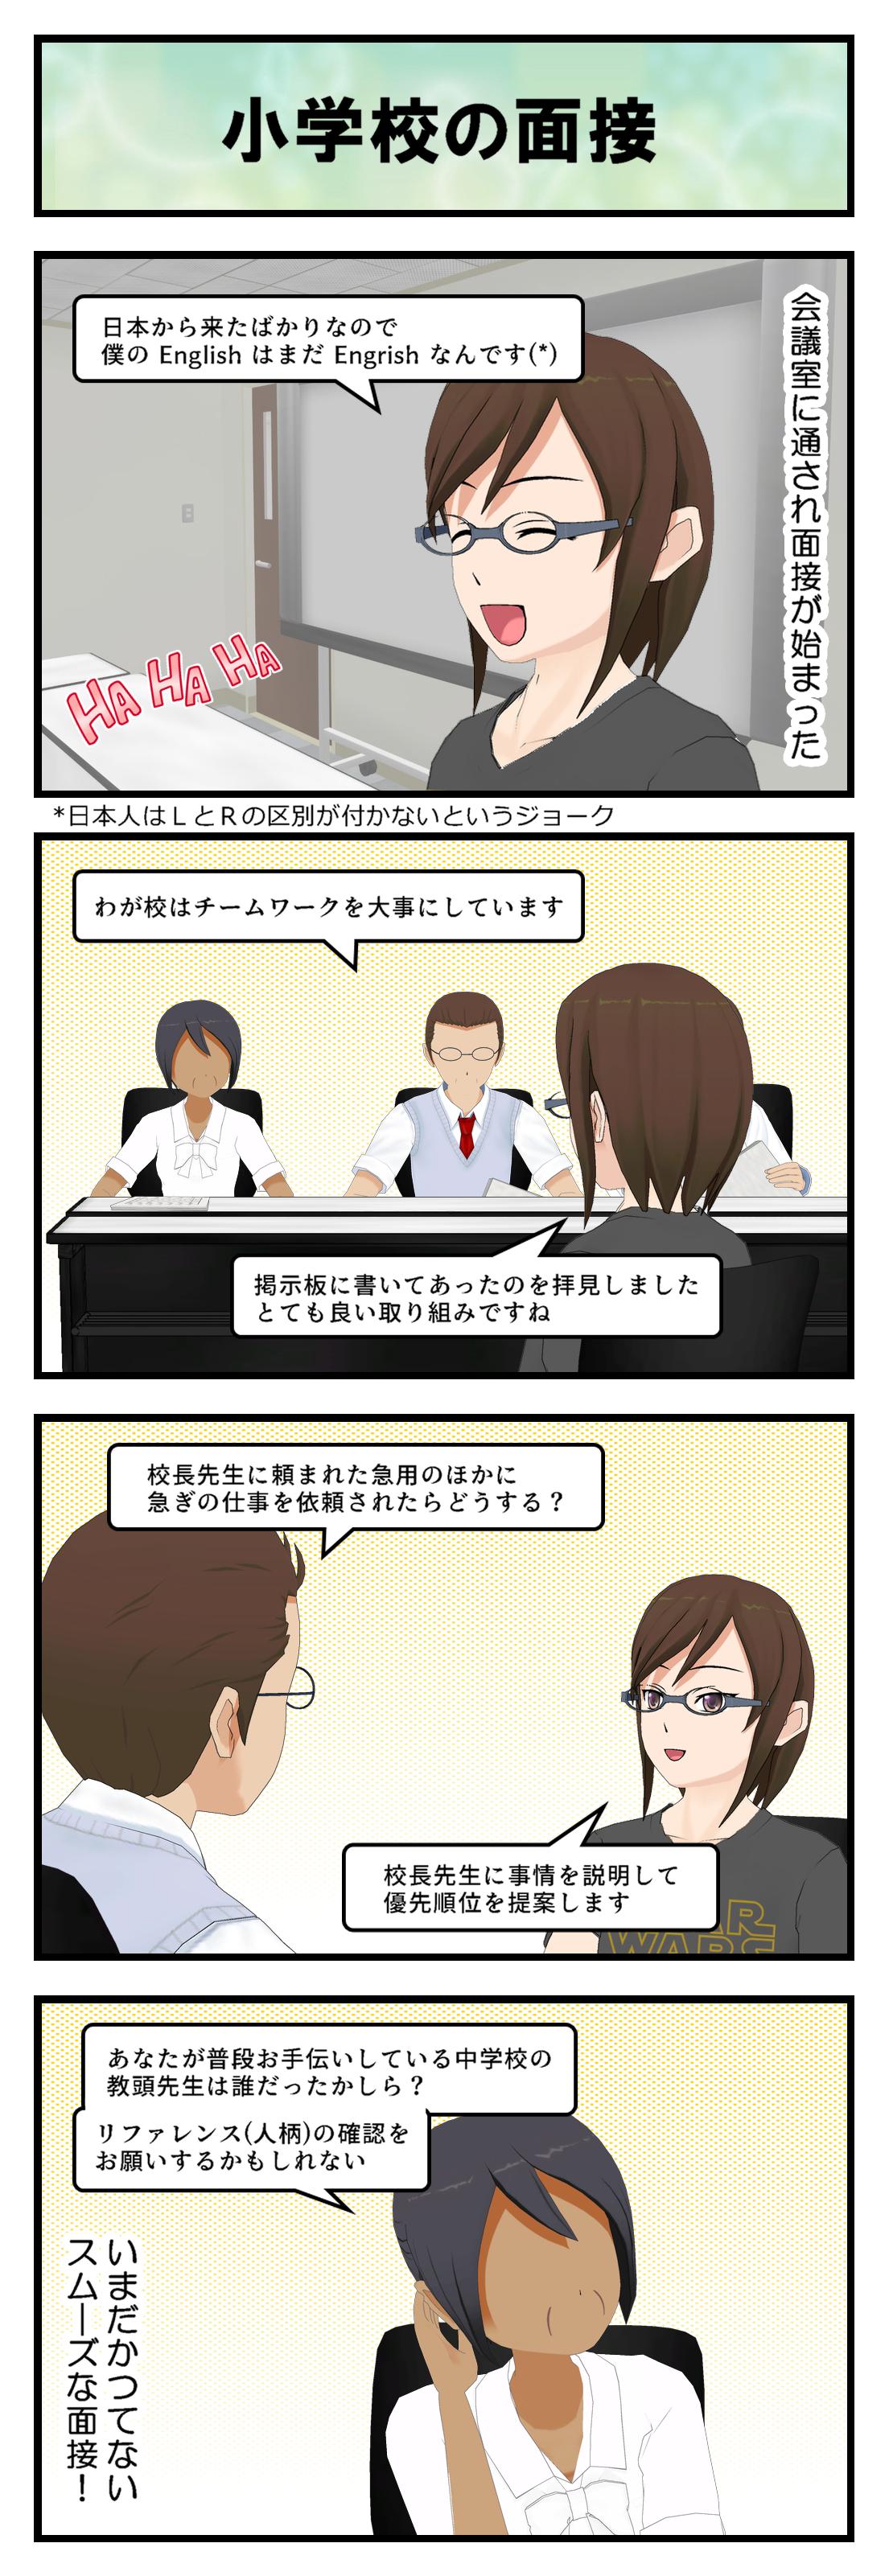 R496_S小学校3_001